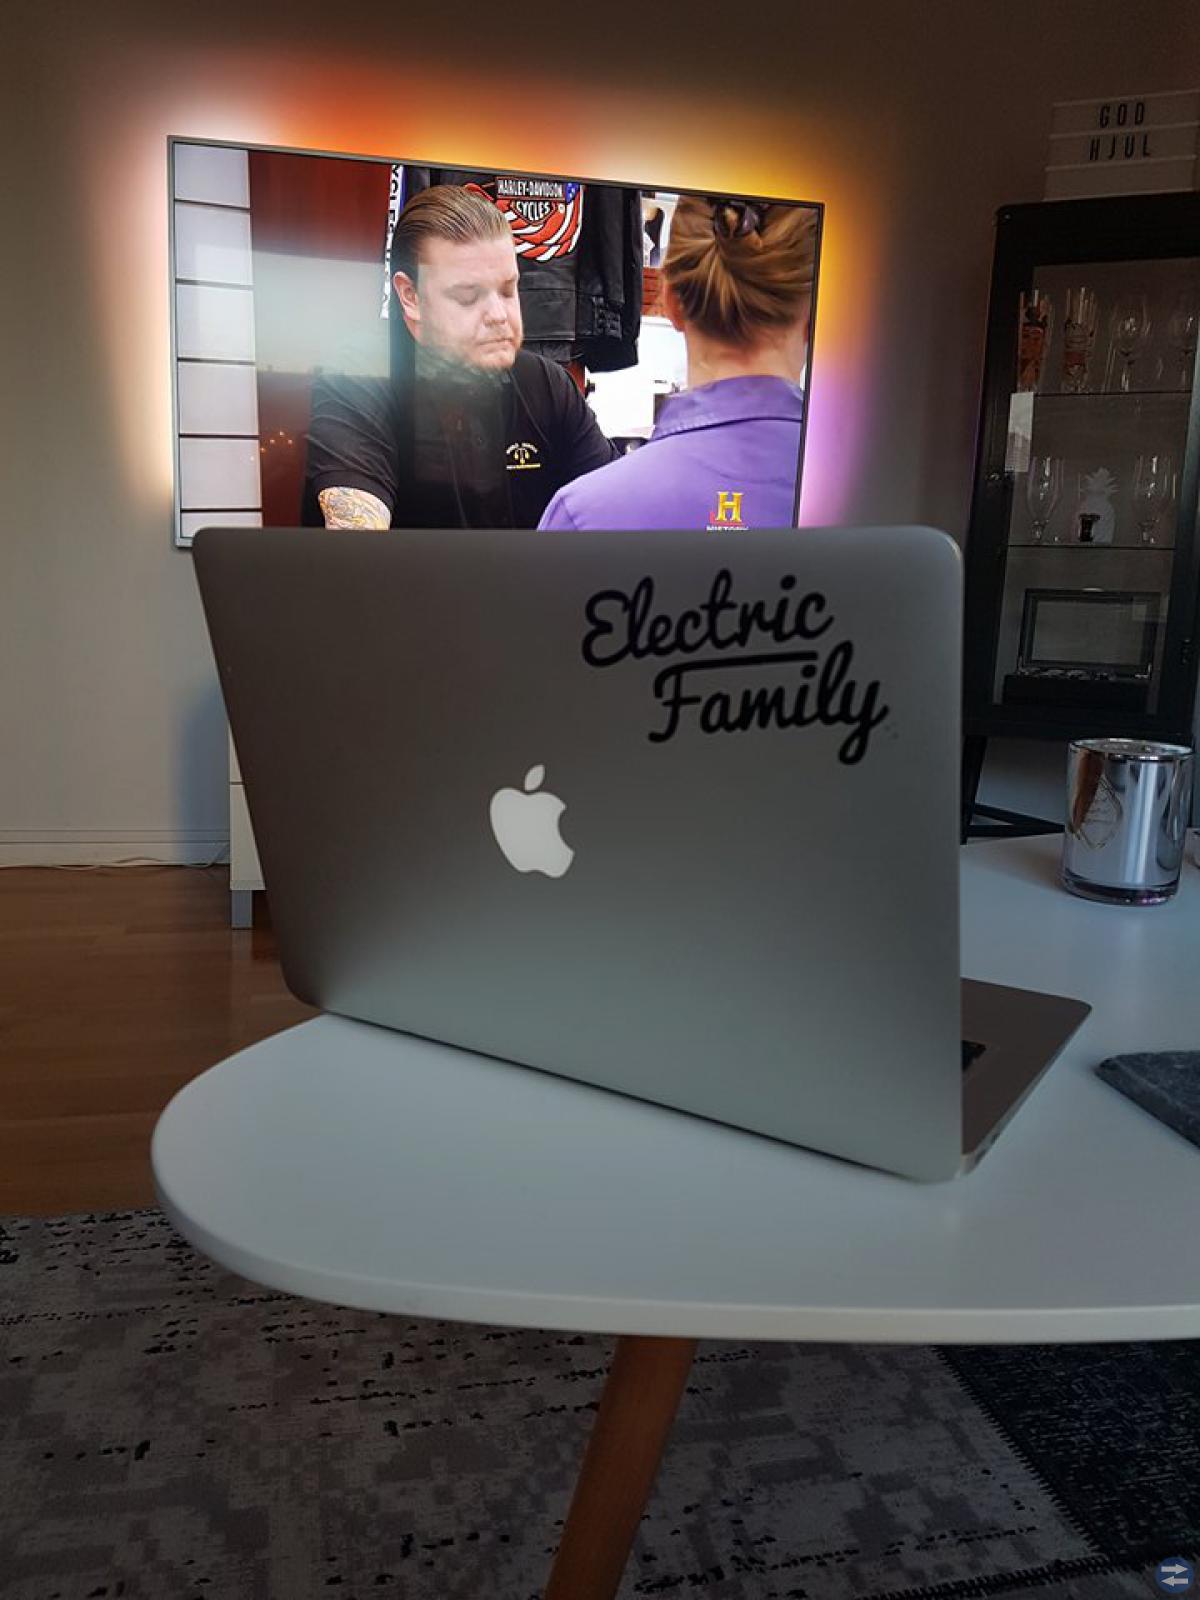 Macbook Air 13 i5